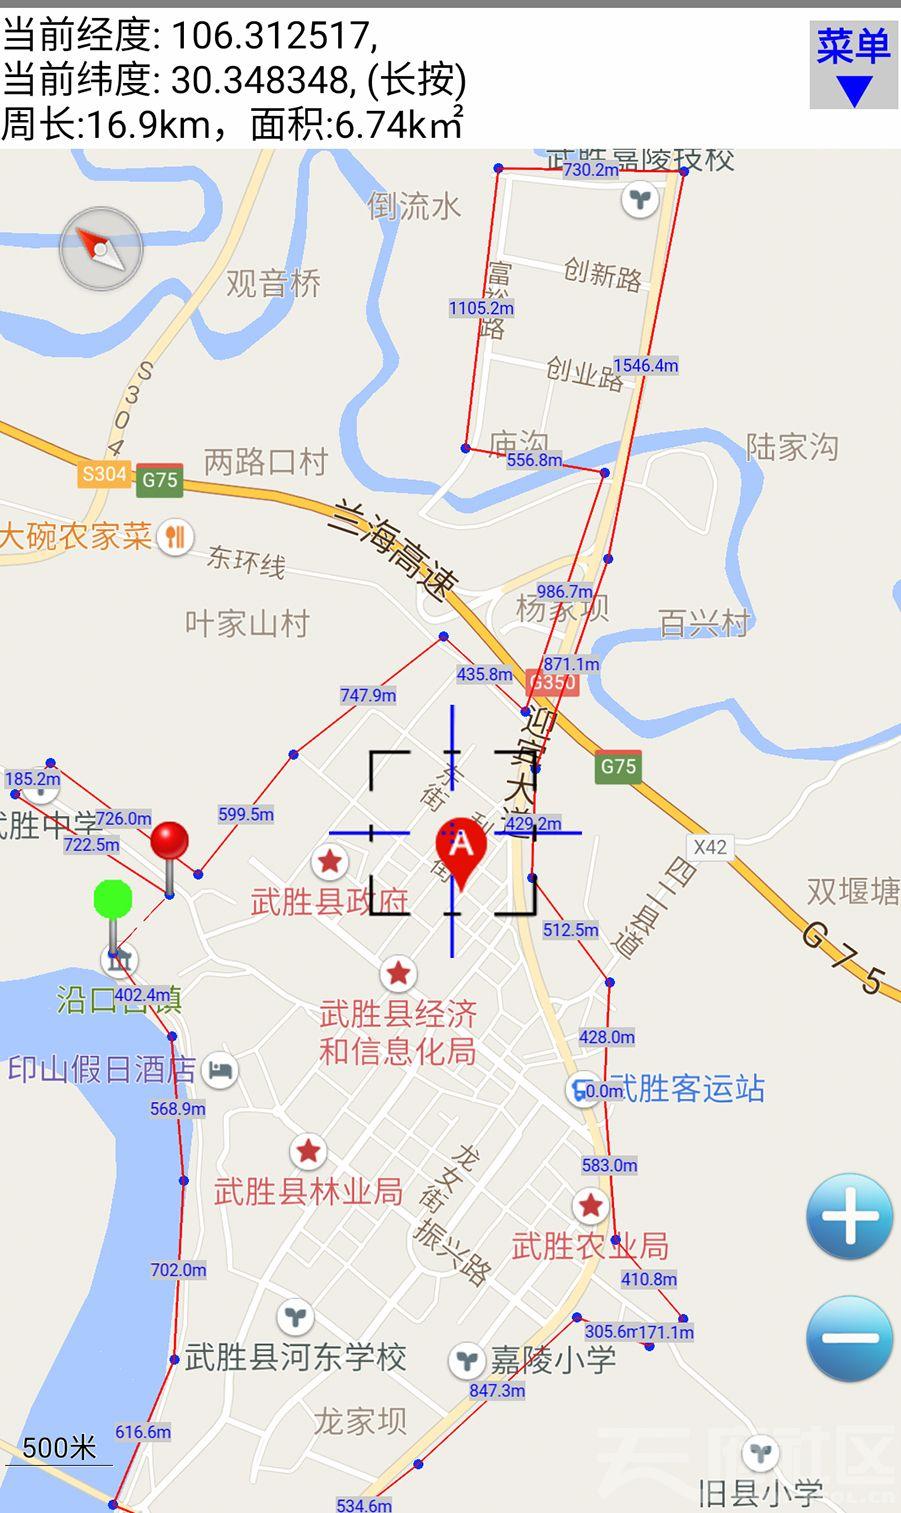 Screenshot_2017-06-14-18-28-17-572_com.baidumap.luohangsan_mh1497436174464.jpg